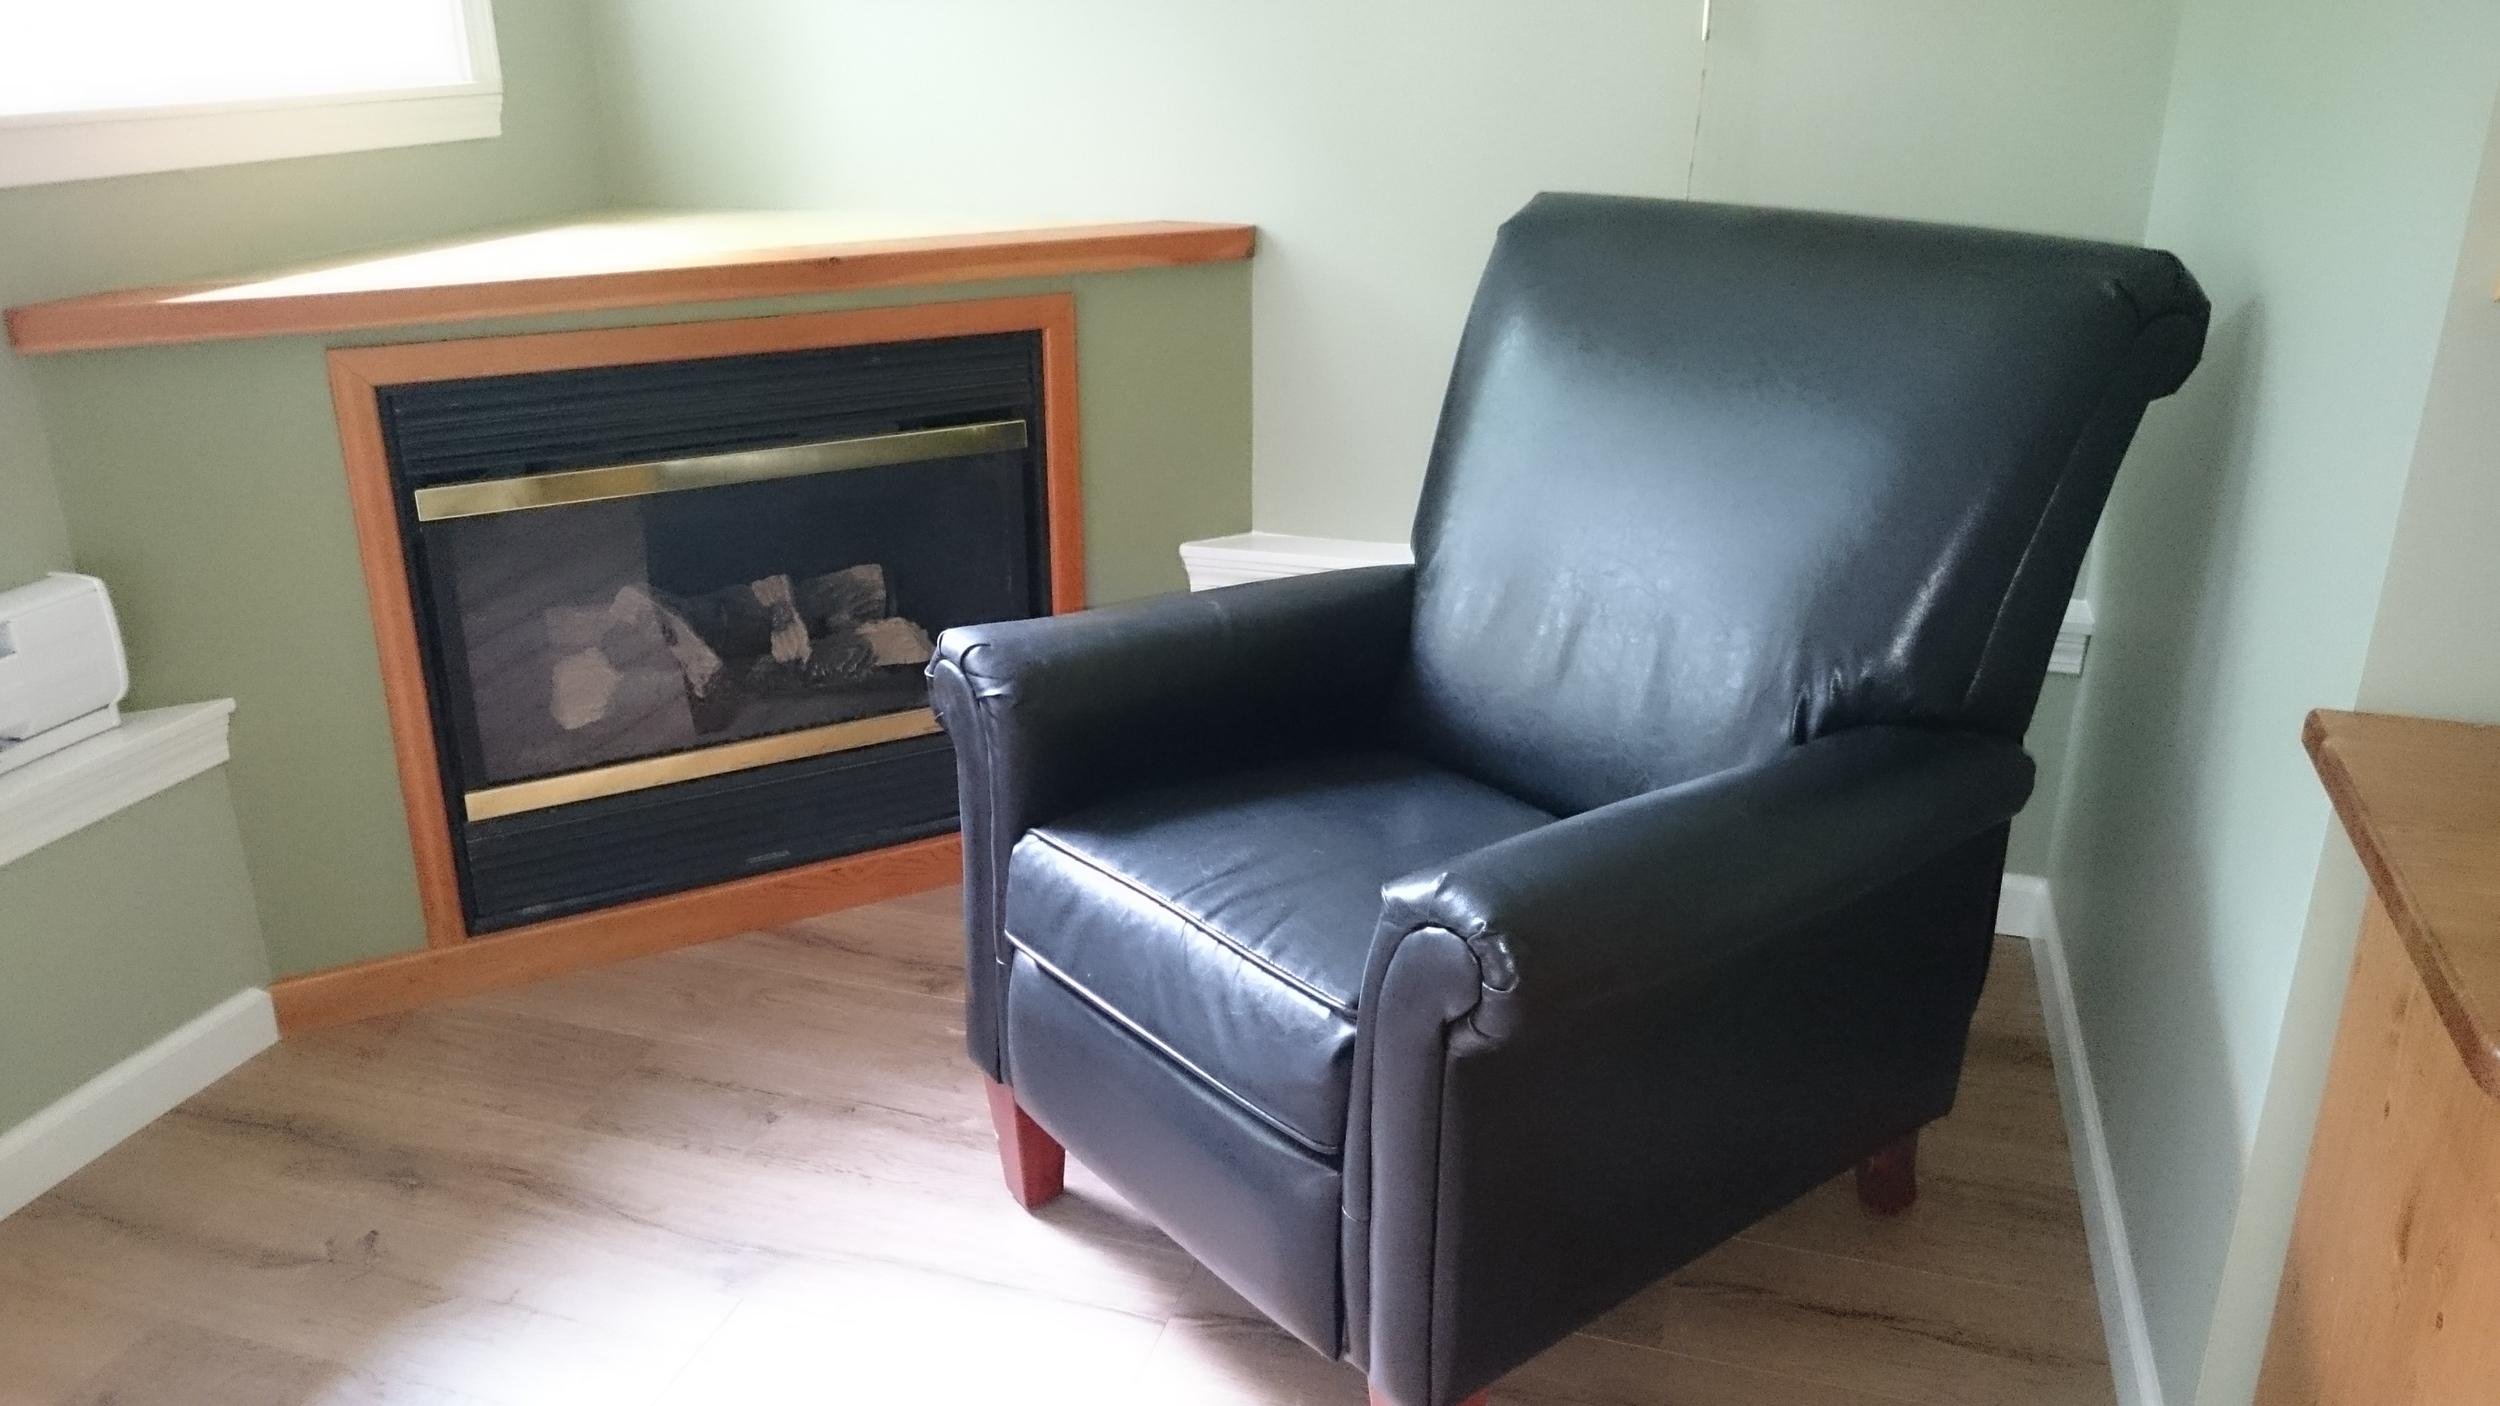 creekside chair and fireplace.JPG